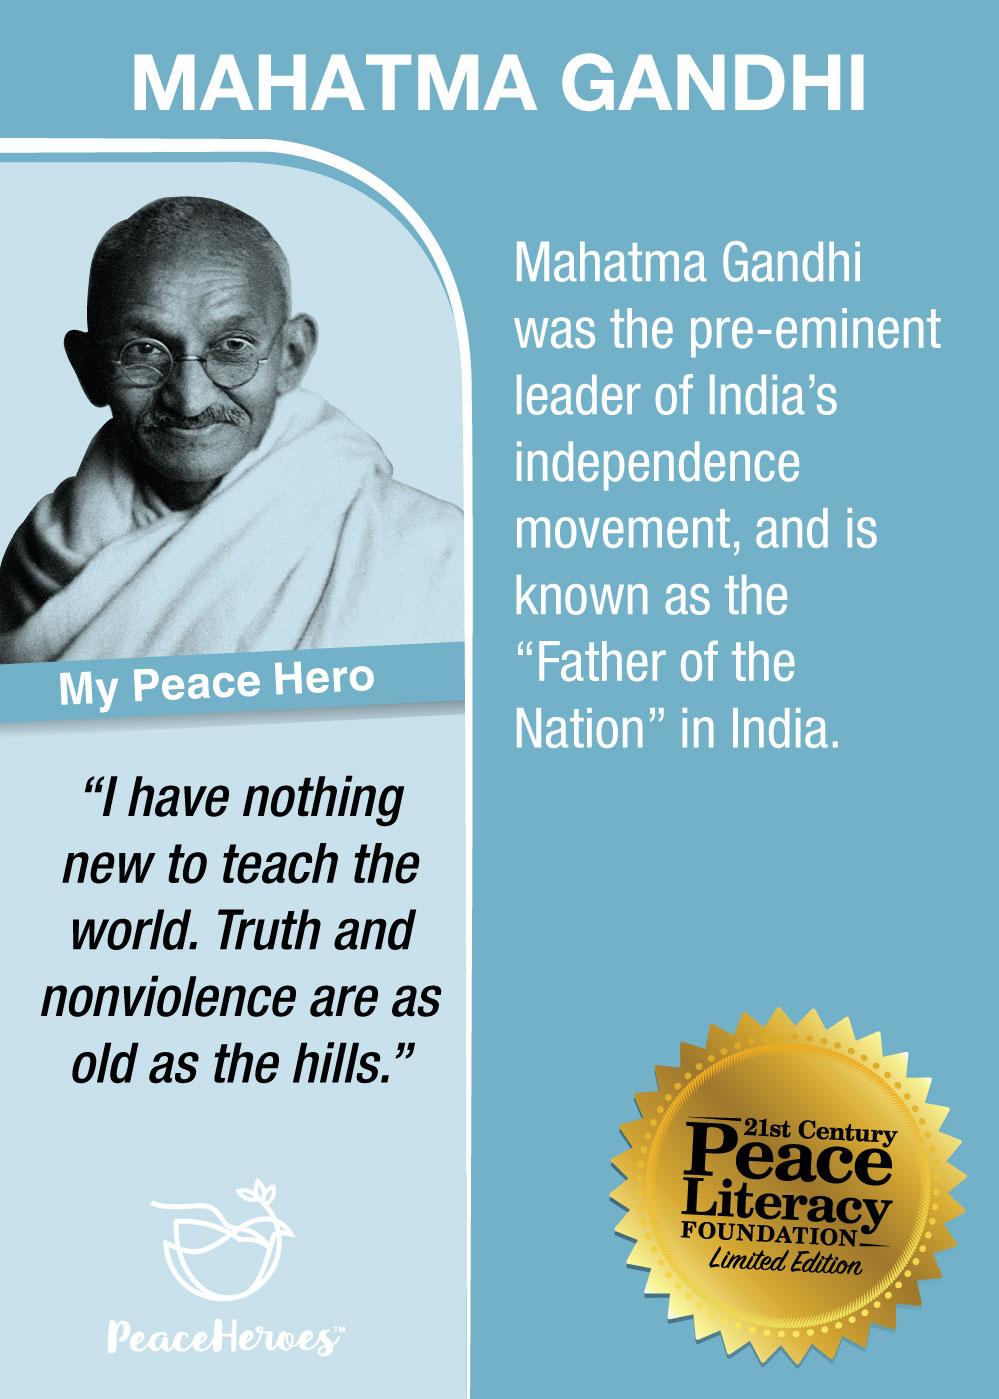 GandhiMahatma copy.jpg